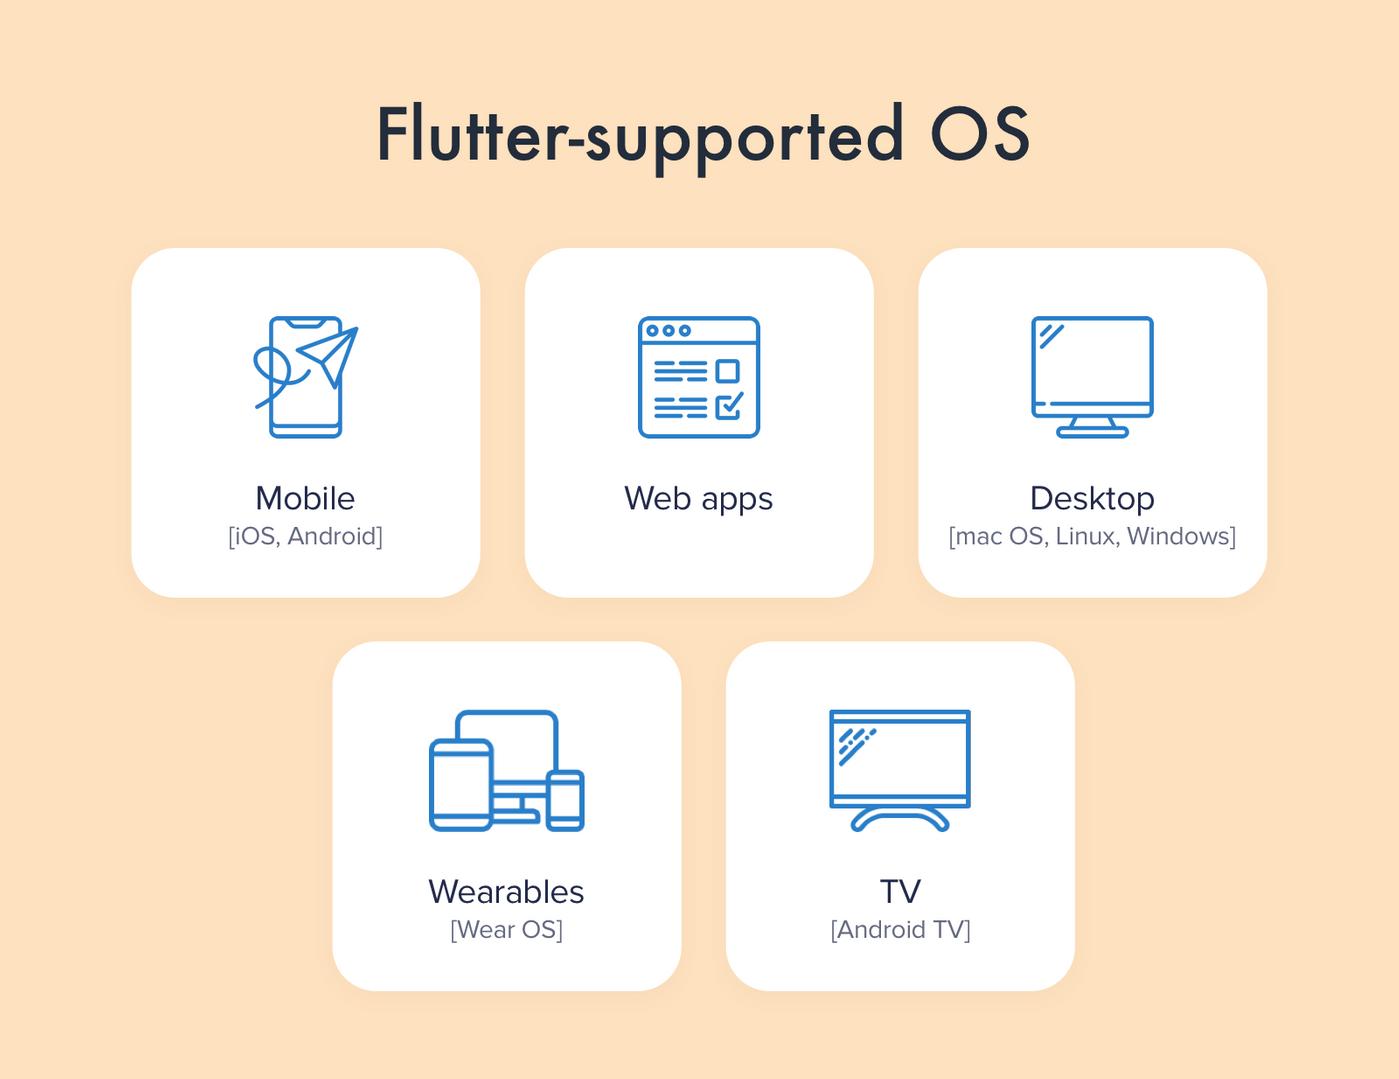 Flutter-supported OS